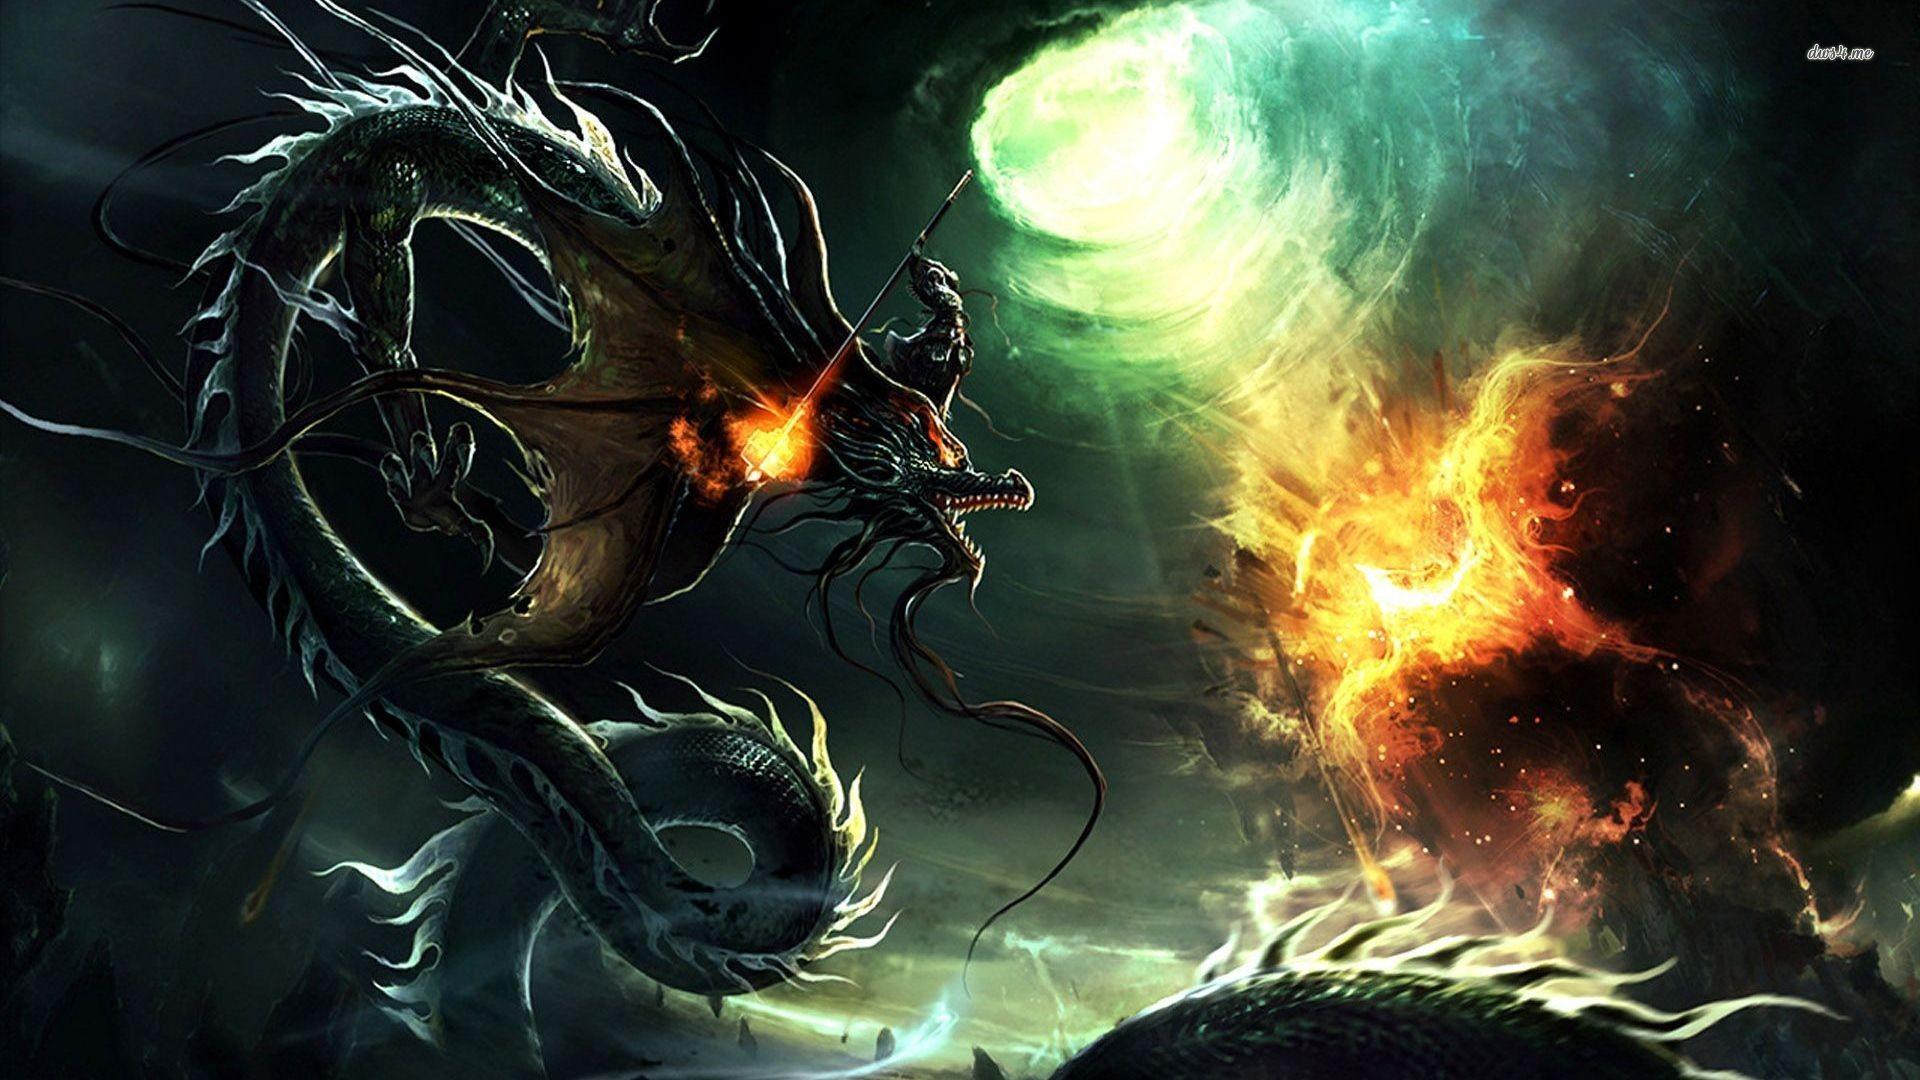 Dragon vs phoenix wallpaper | Wallpaper Wide HD